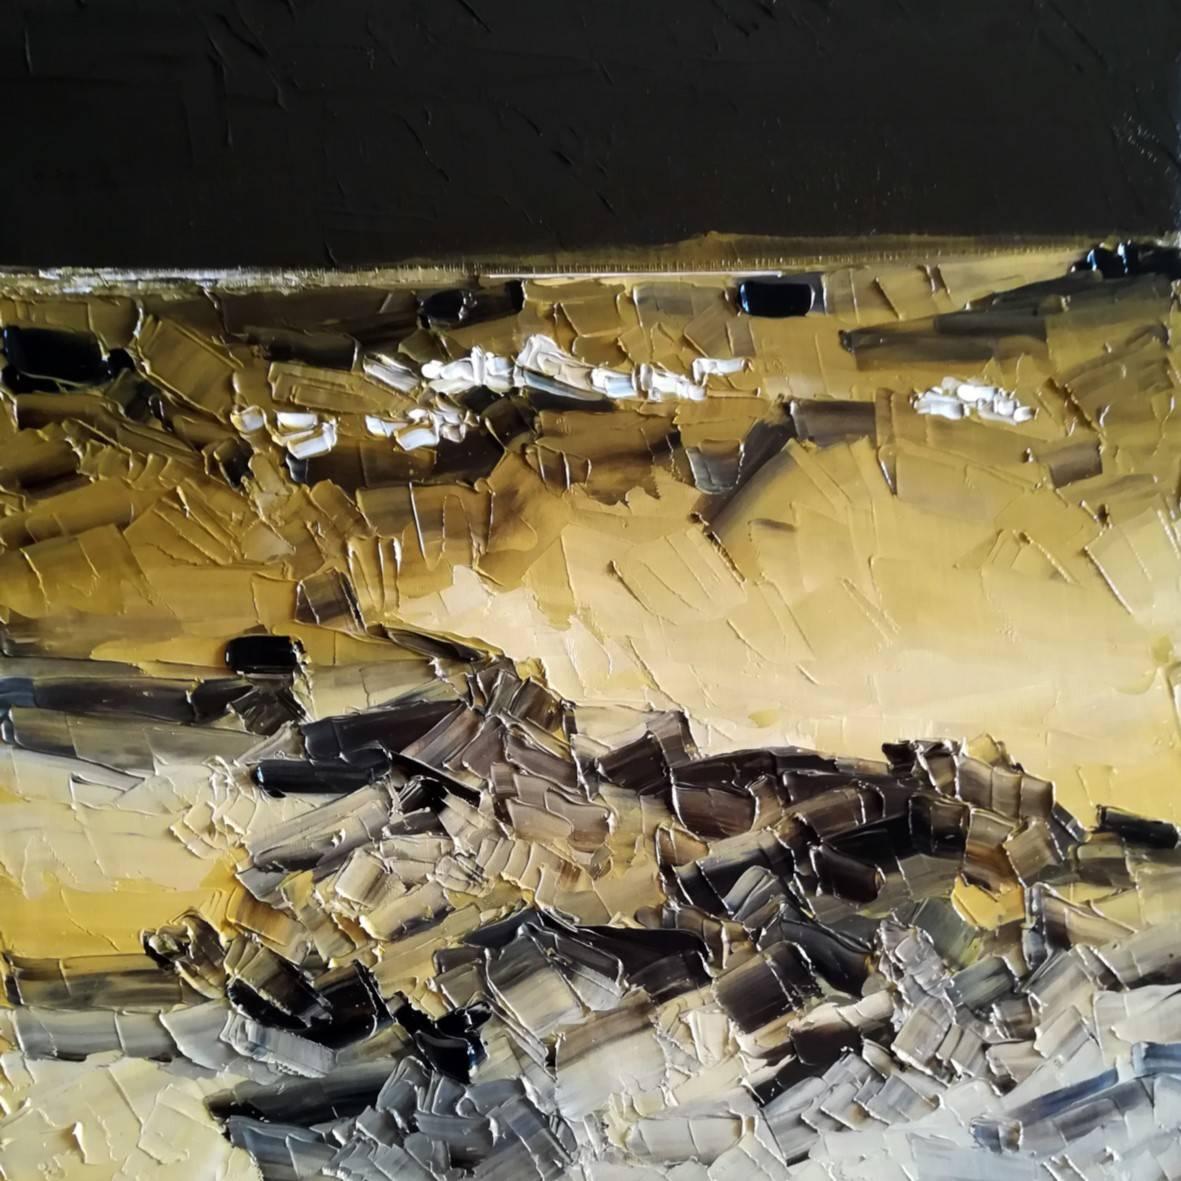 Campohermoso in. 2019 óleo espátula lienzo 31 x 31 cm. http://bohemiogus.blogspot.com